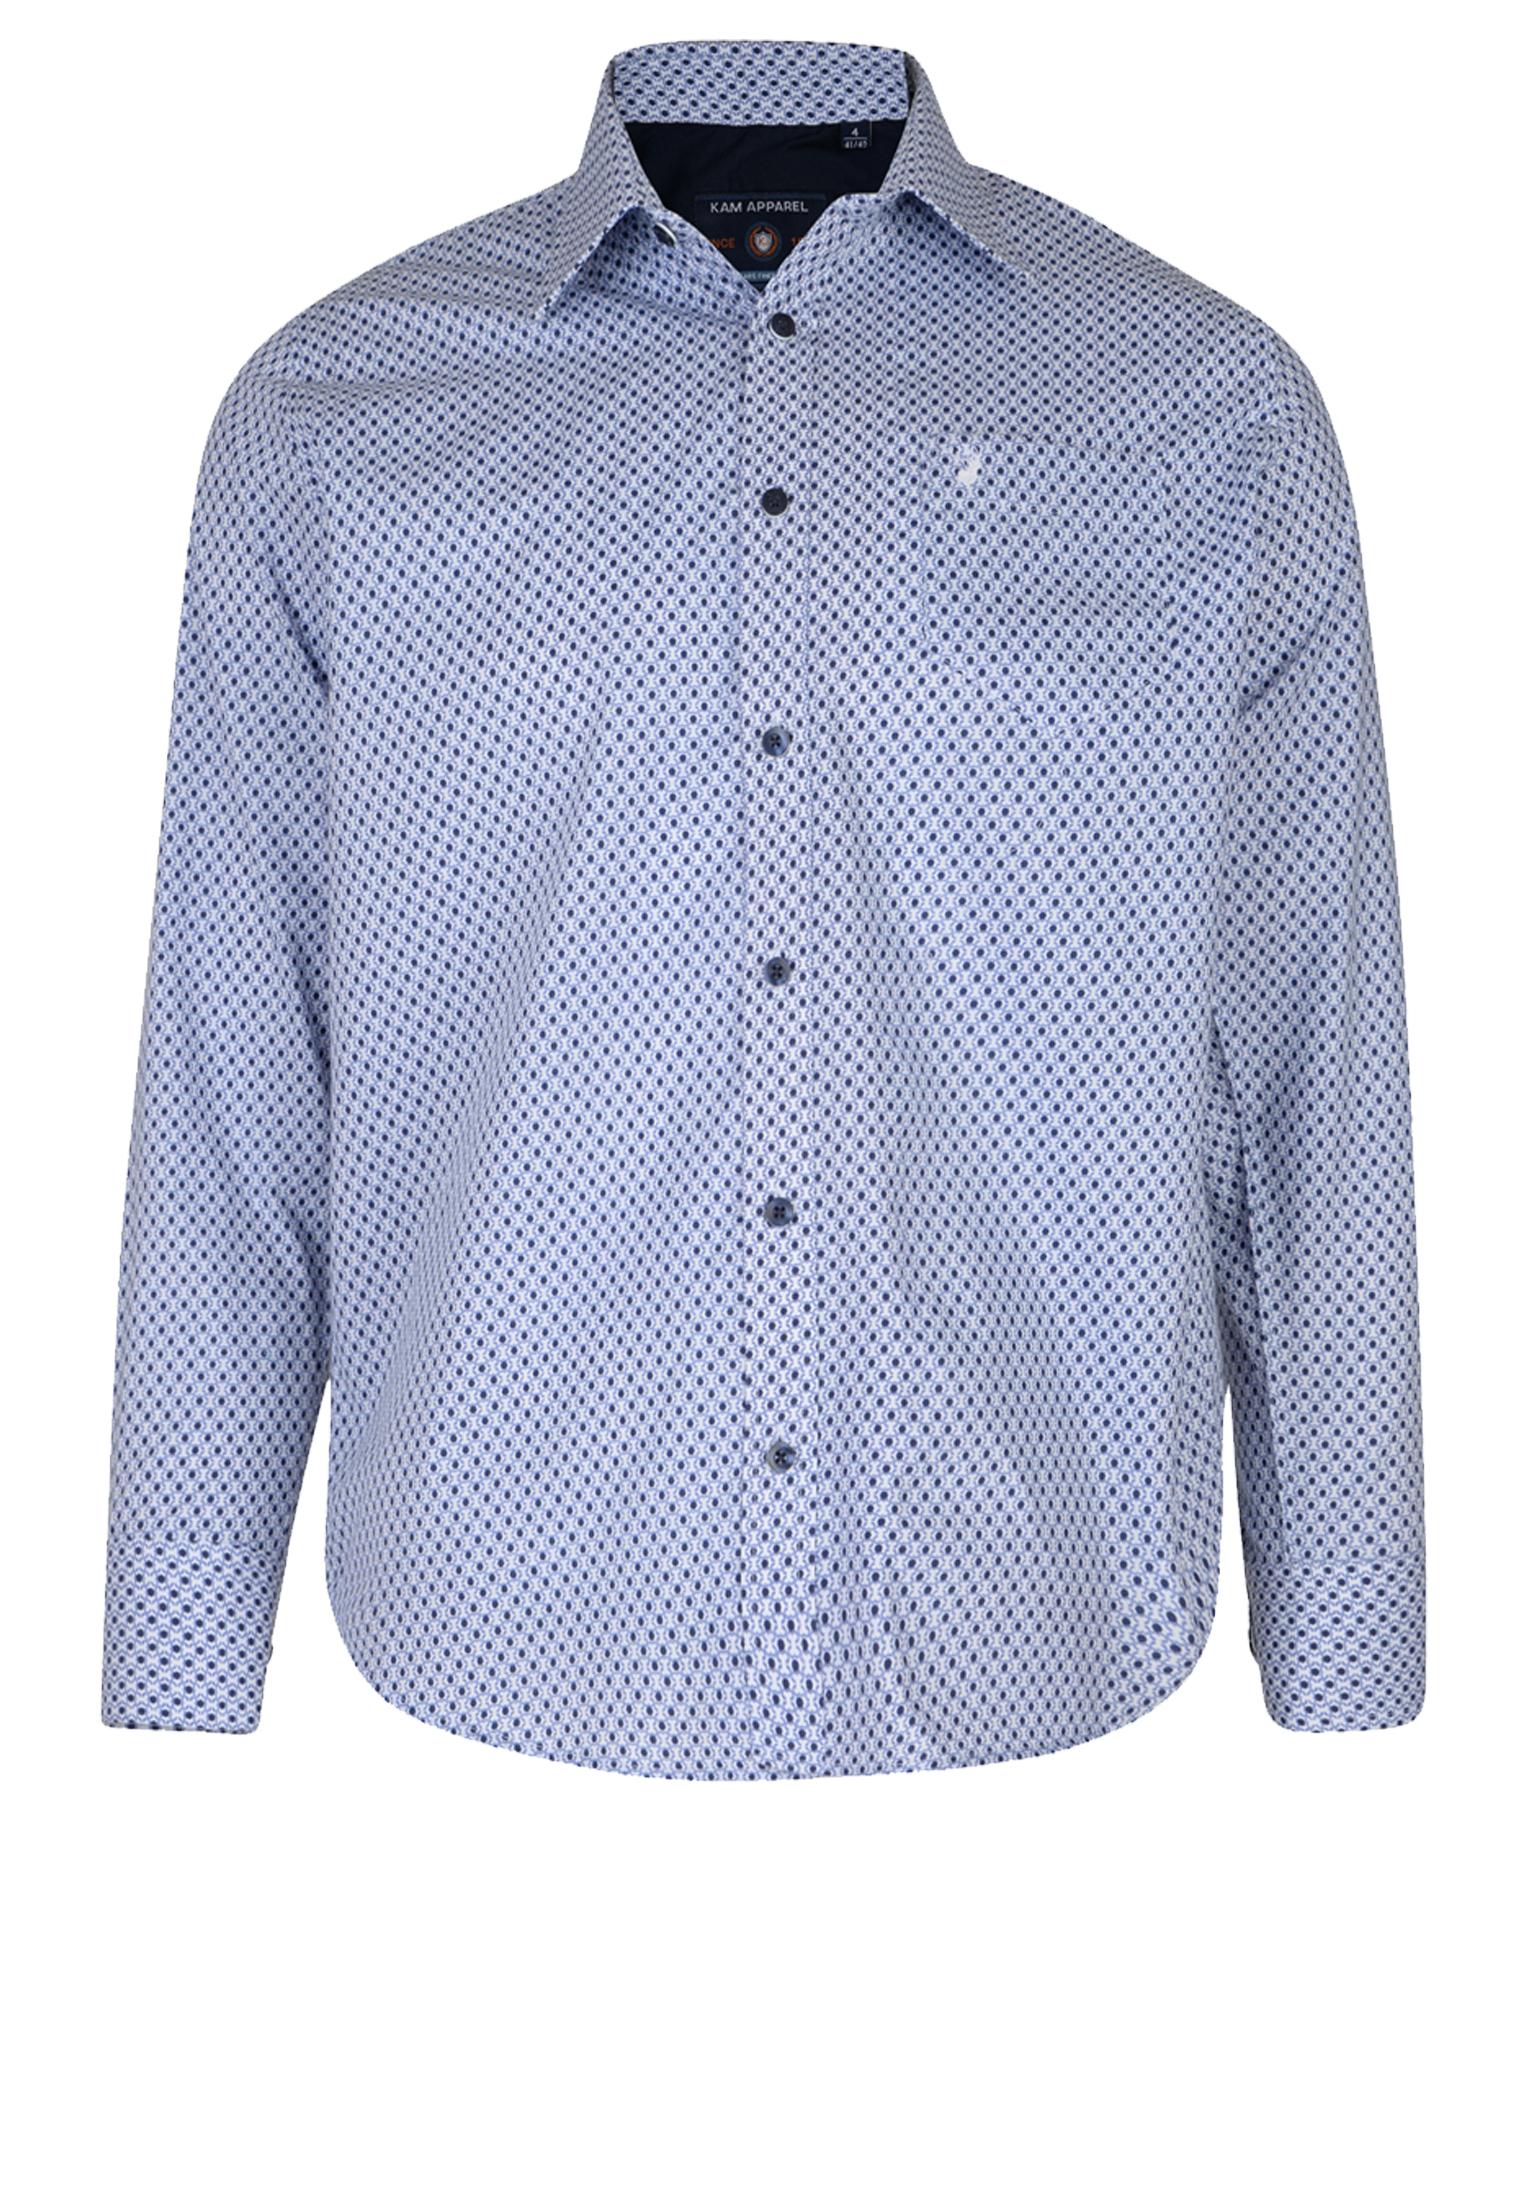 Het Overhemd.Kam Overhemd 2xl 8xl Blauw Bestel Nu Bij Melvinsi